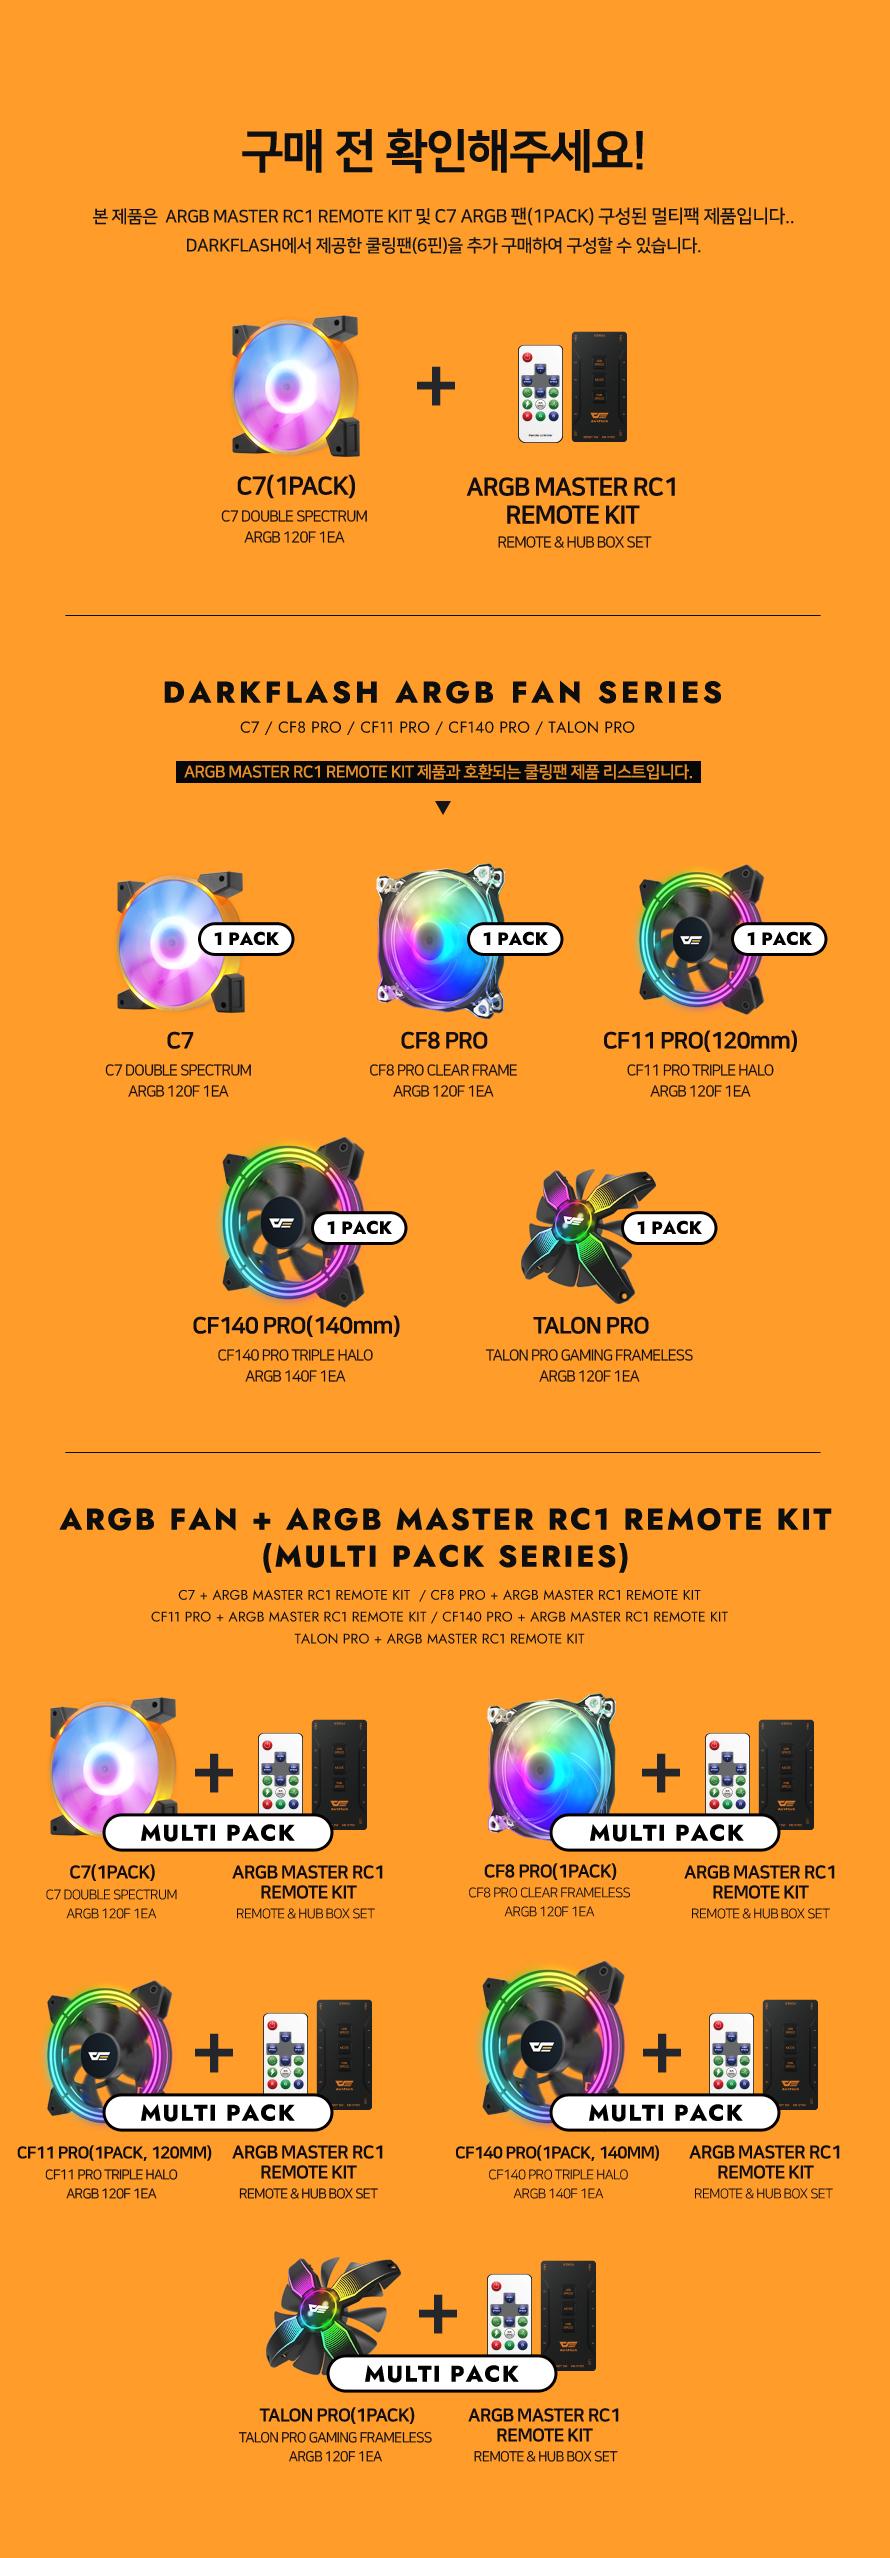 darkFlash C7 ARGB REMOTE COMBO KIT